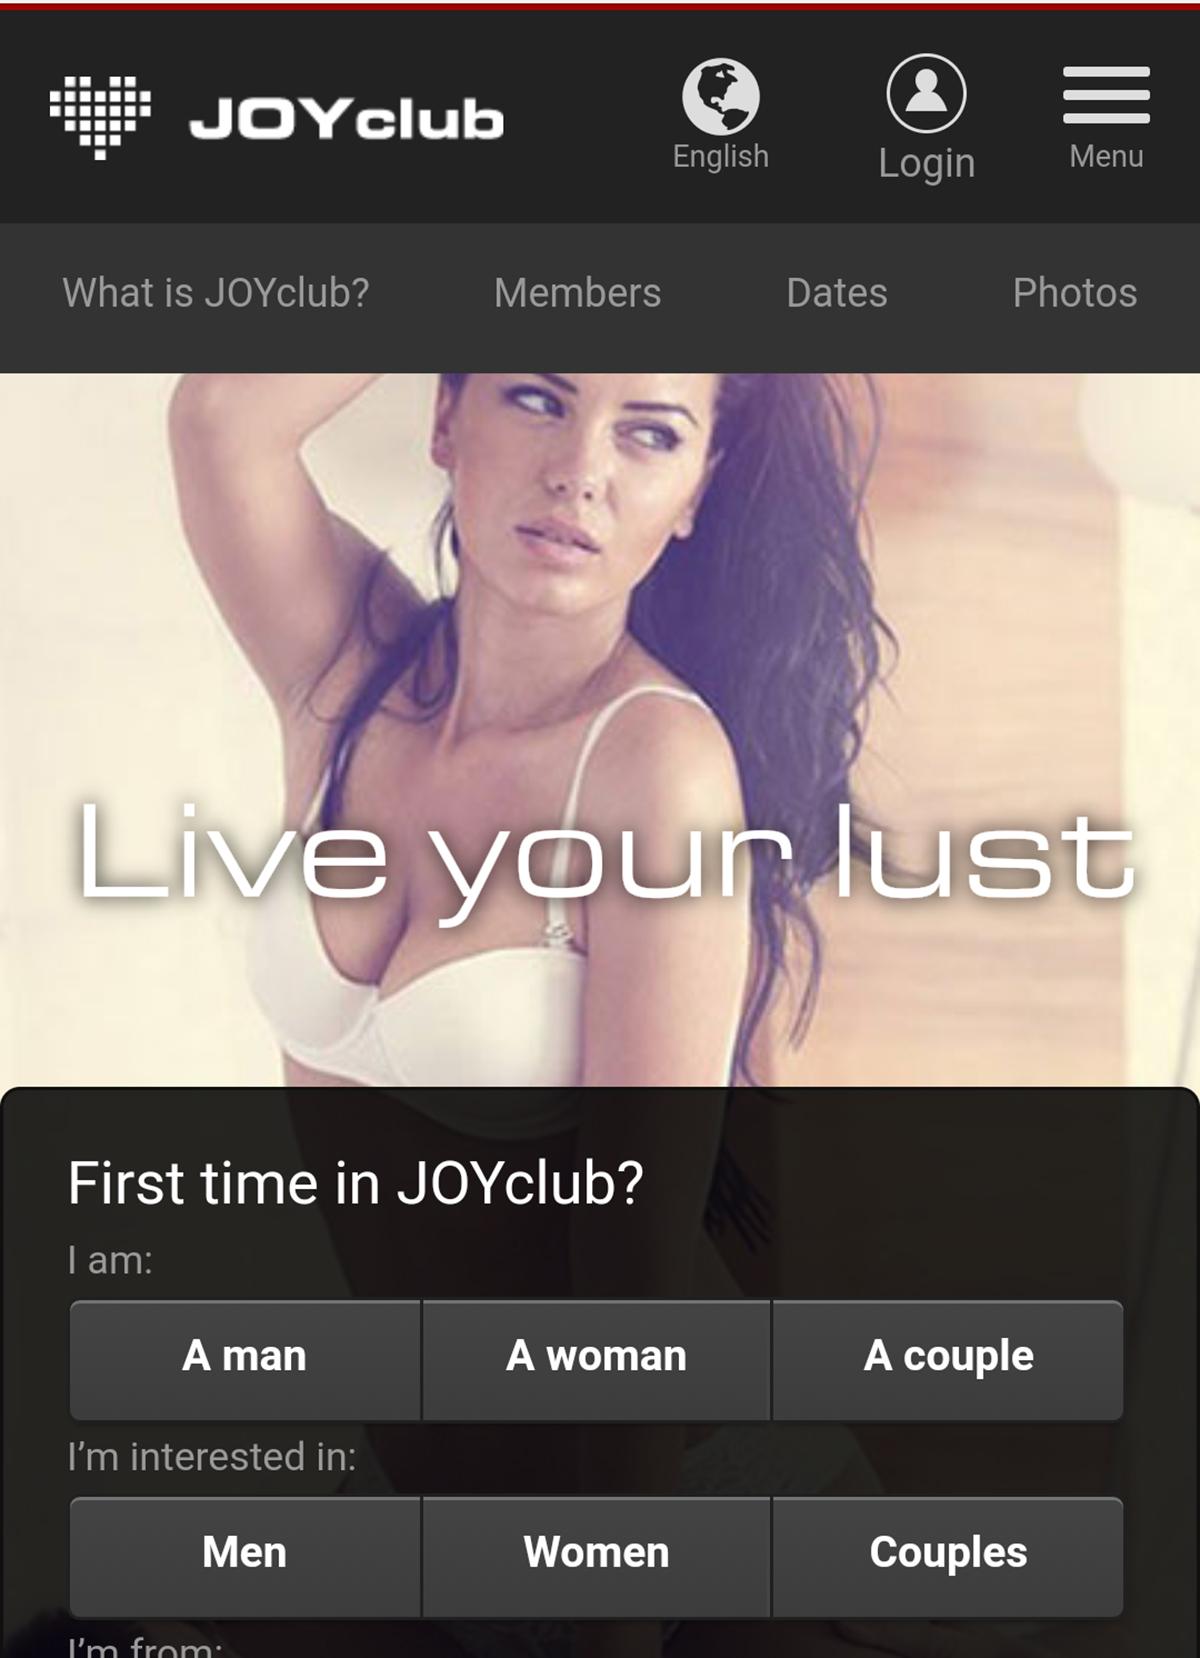 joyclub mobile app